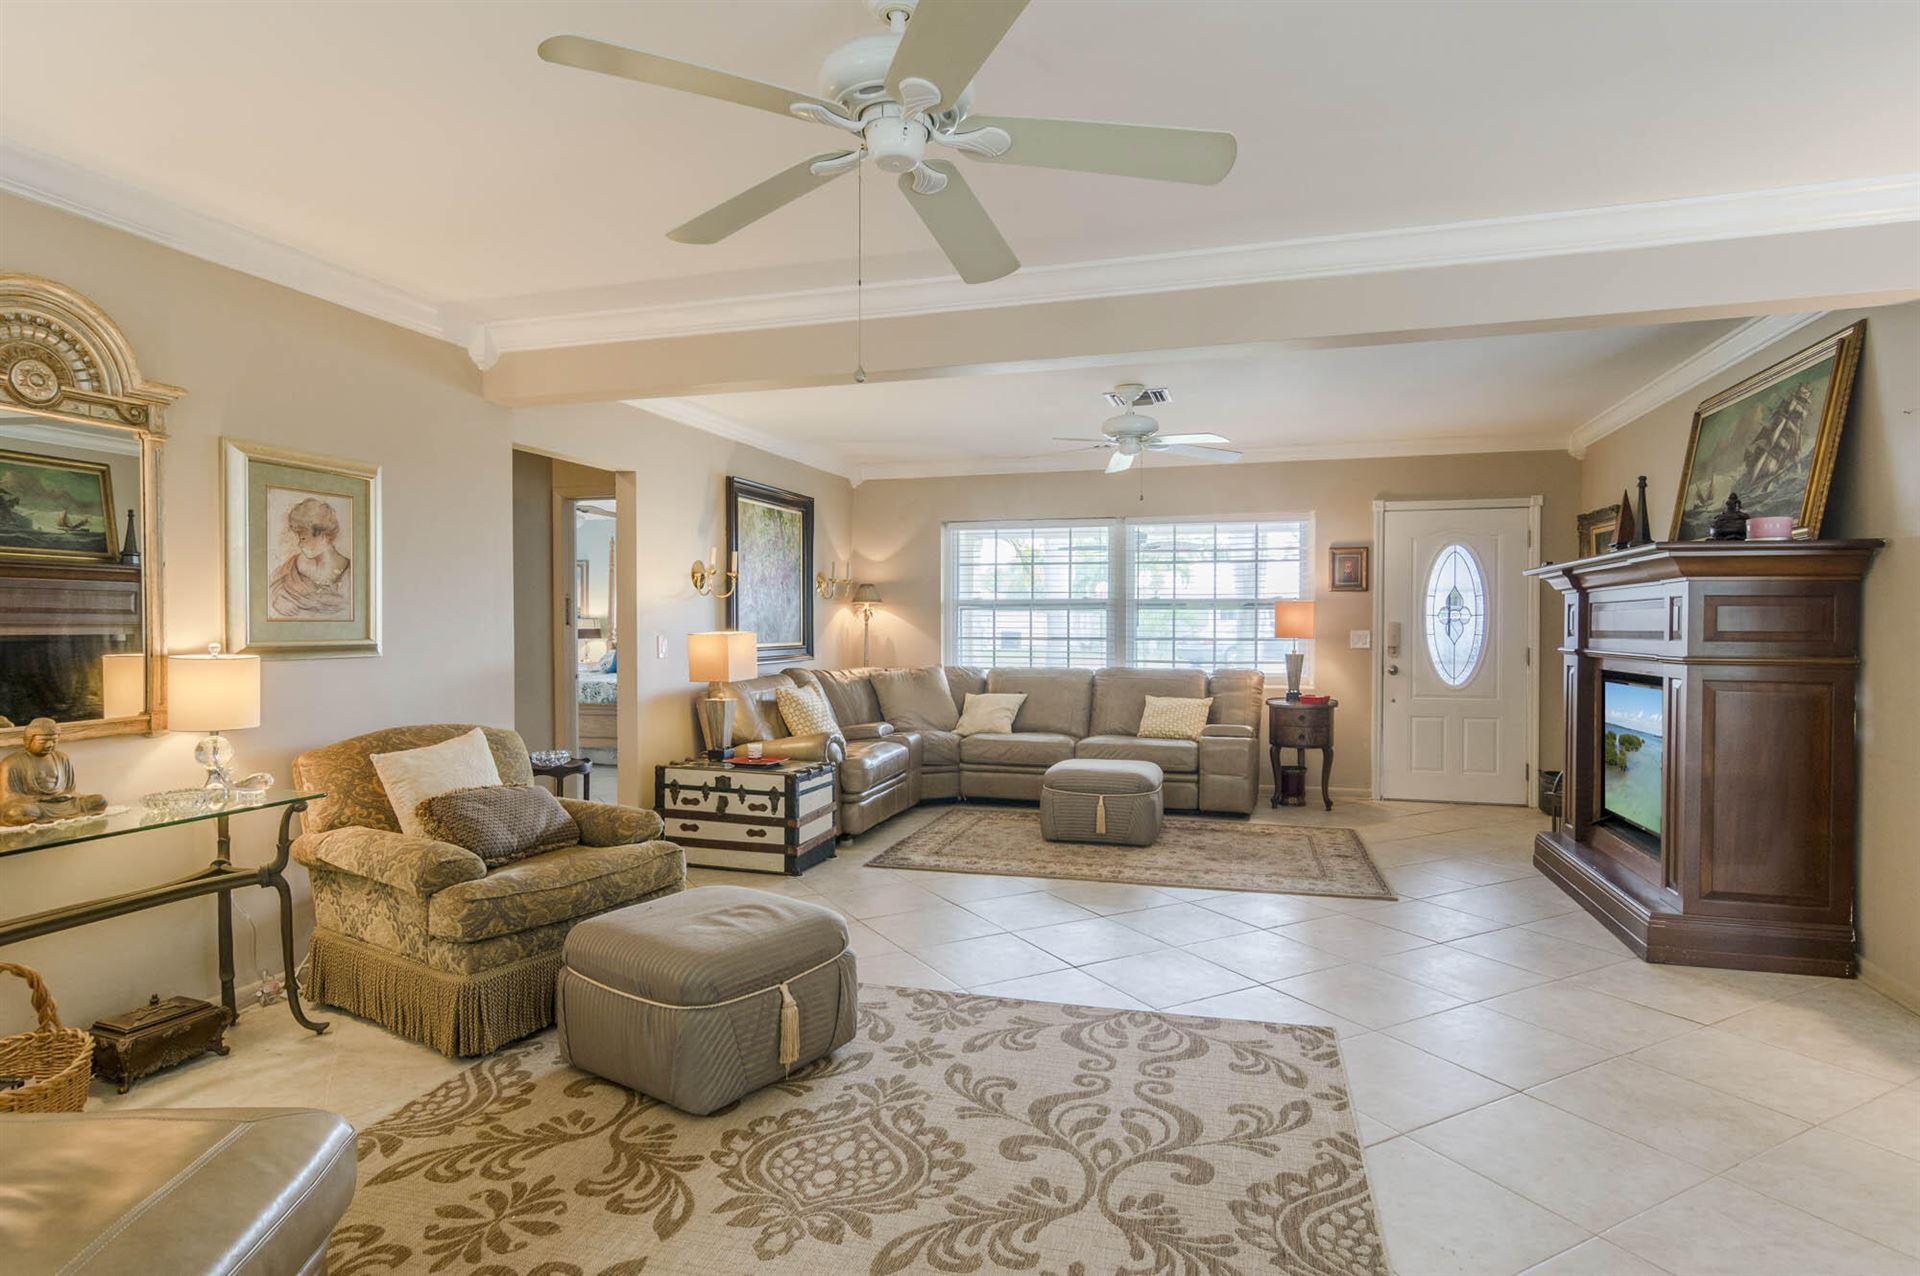 Photo of 1230 Manor Drive, Singer Island, FL 33404 (MLS # RX-10724365)